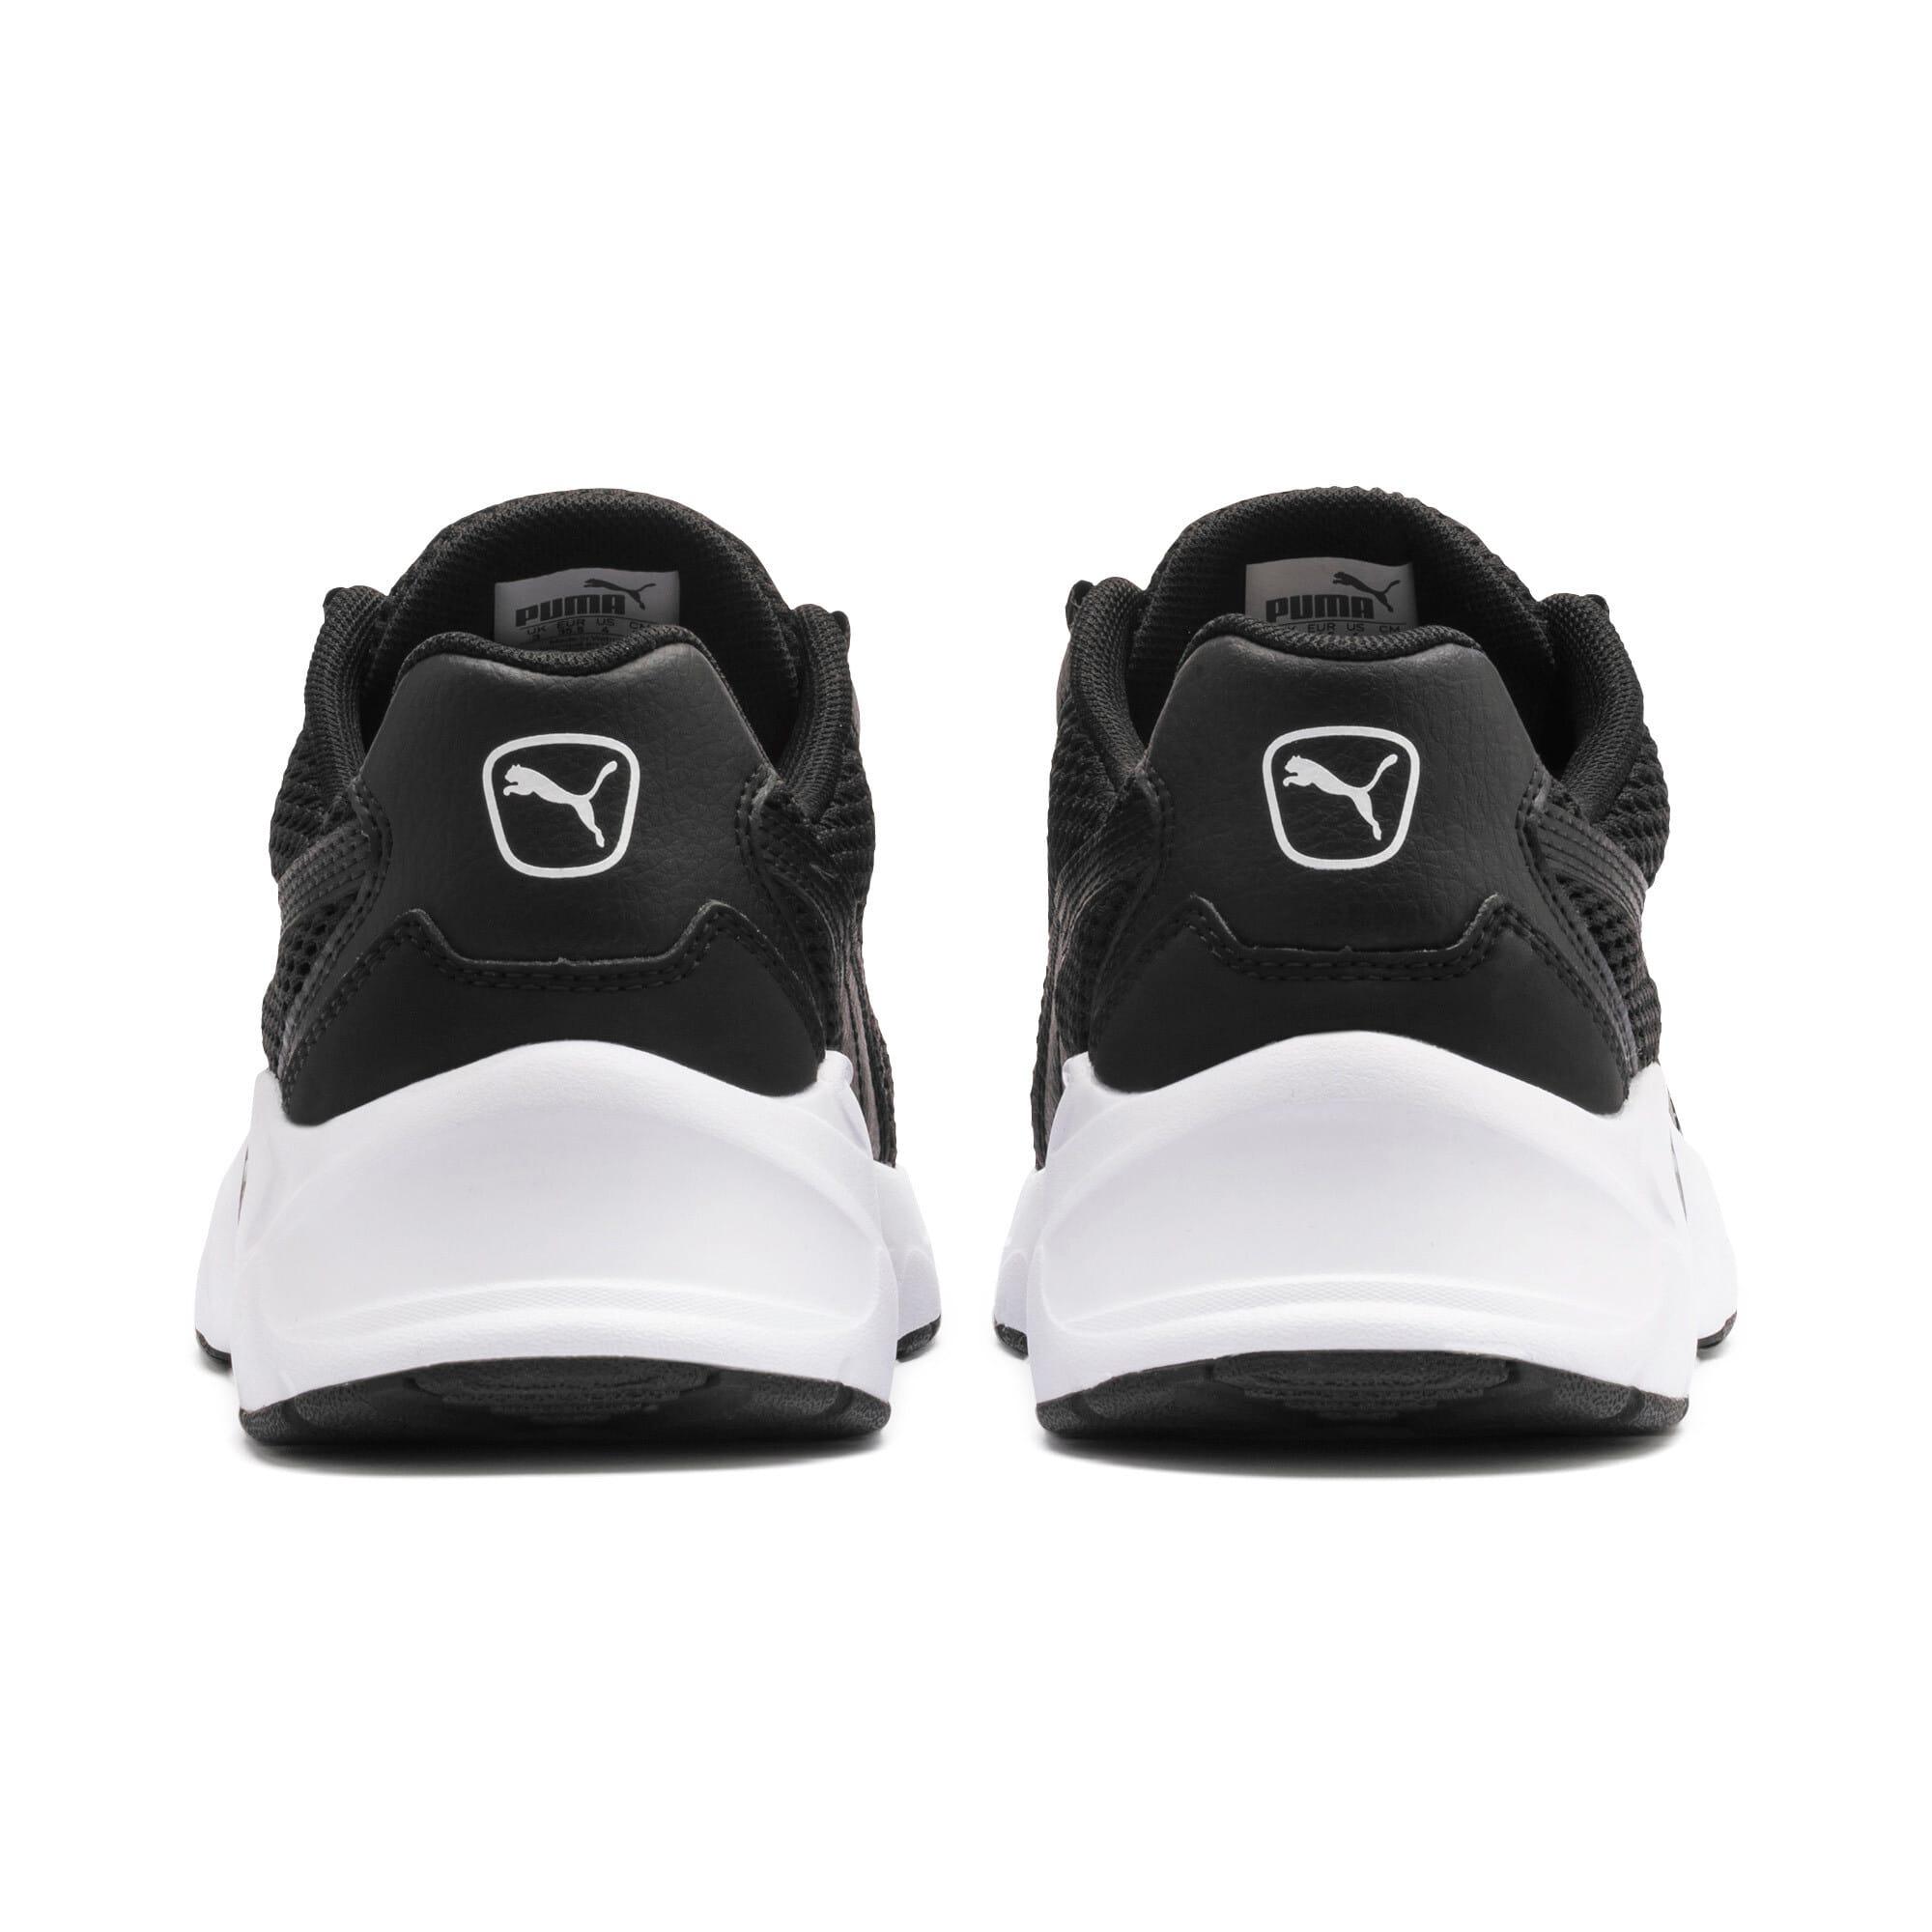 Thumbnail 3 of Nucleus Youth Sneaker, Puma Black-Puma Black, medium